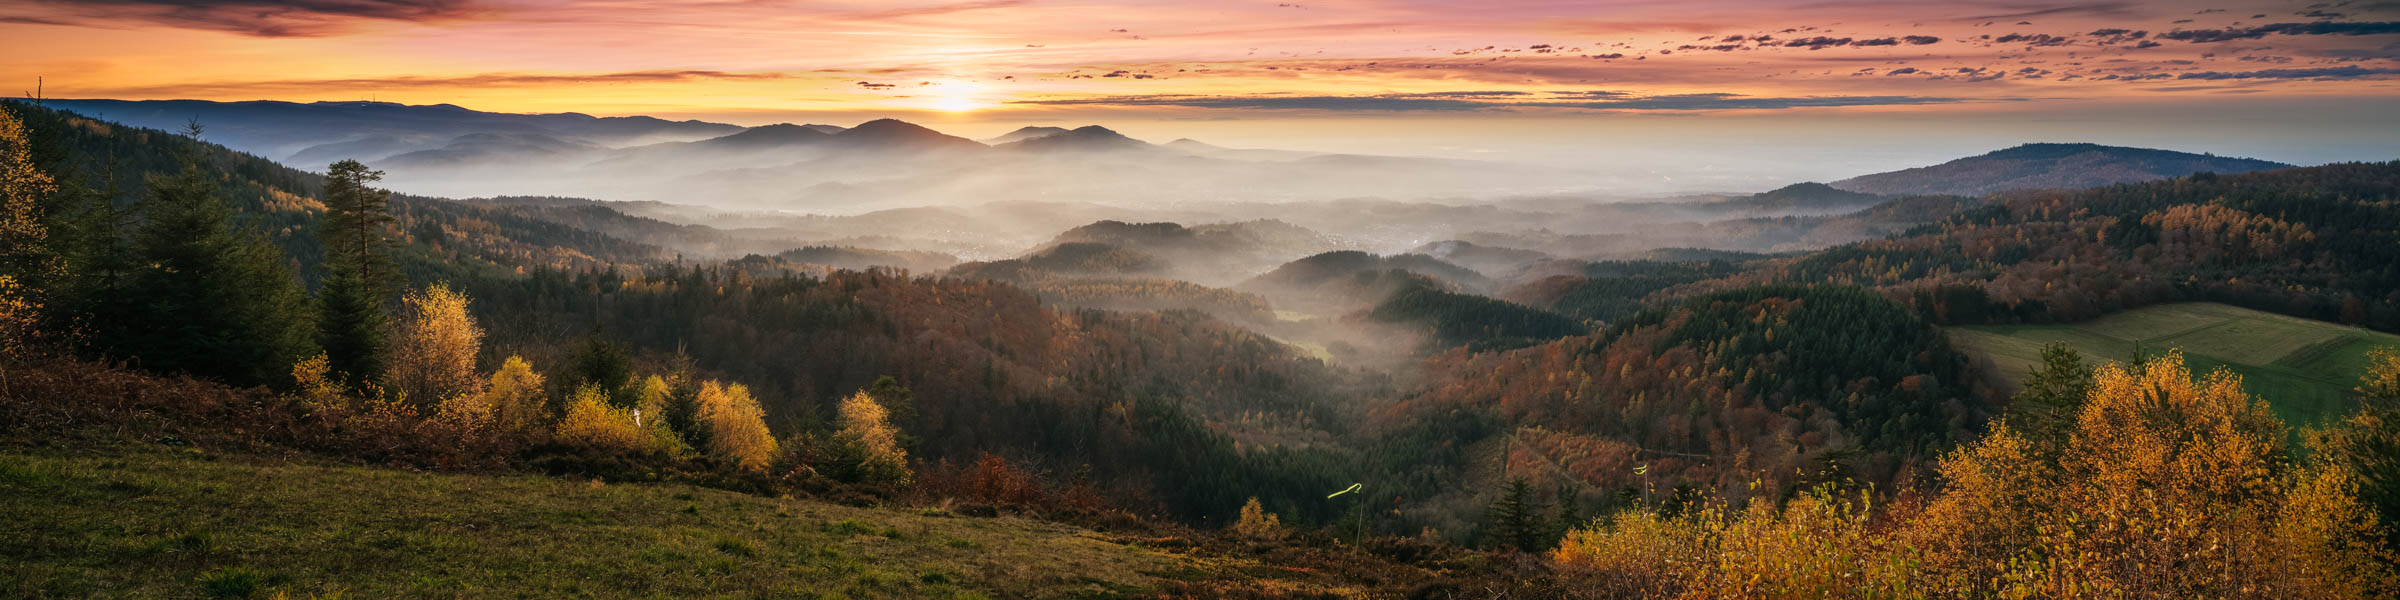 Schwarzwald-Panorama im Sonnenuntergang